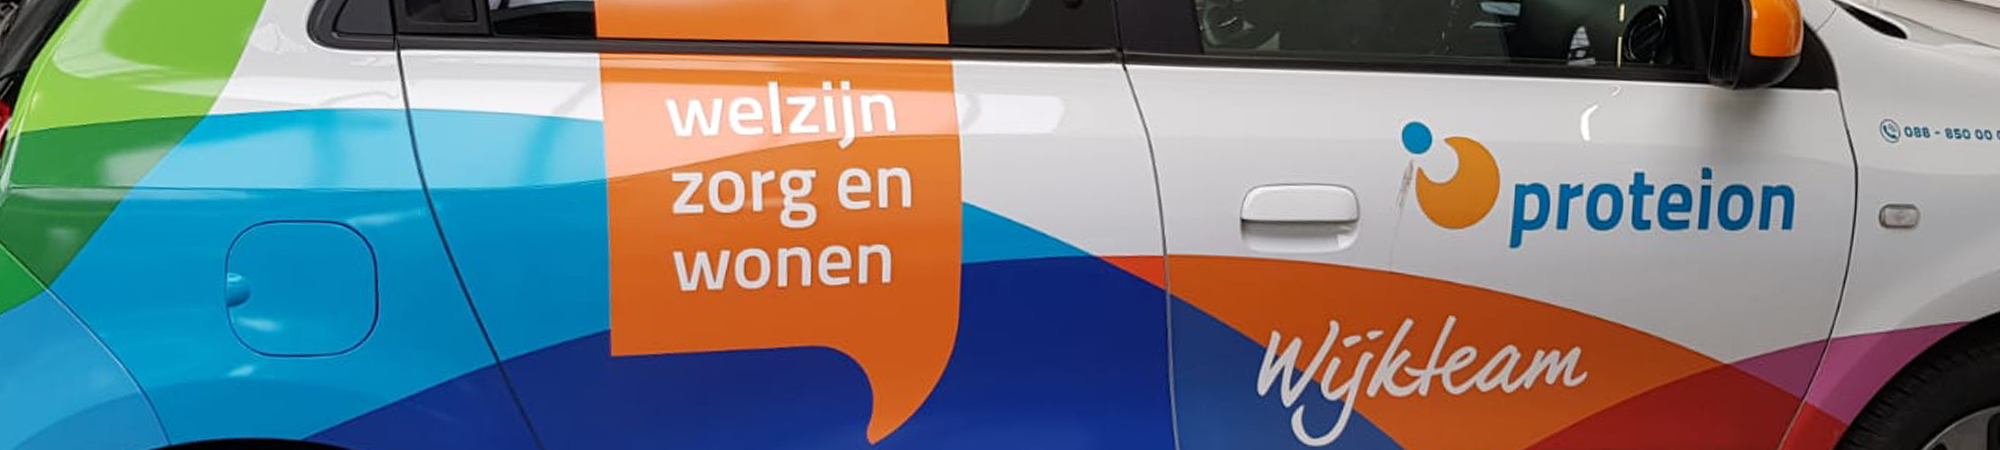 Carwrapping - Schadenet Venlo